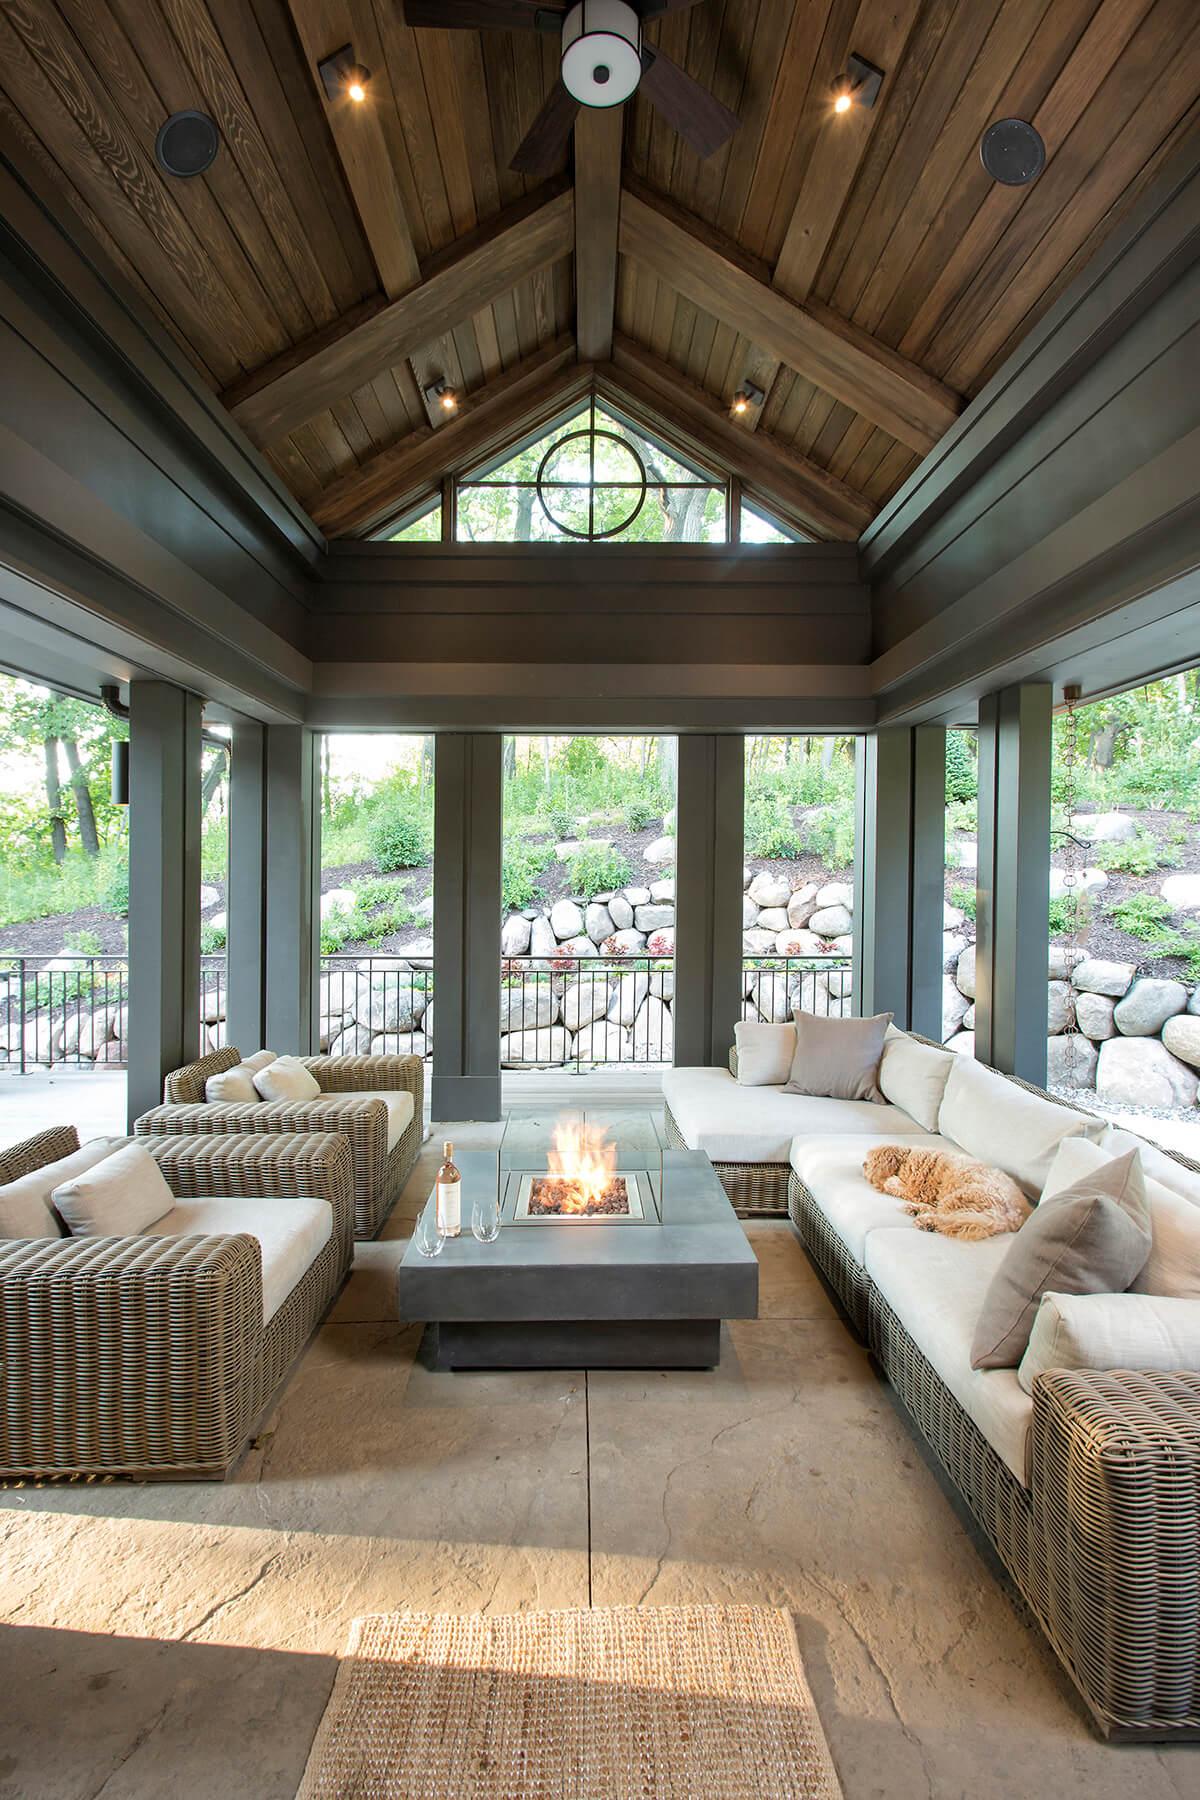 32 Best Beach House Interior Design Ideas and Decorations ... on House Interior Ideas  id=71190